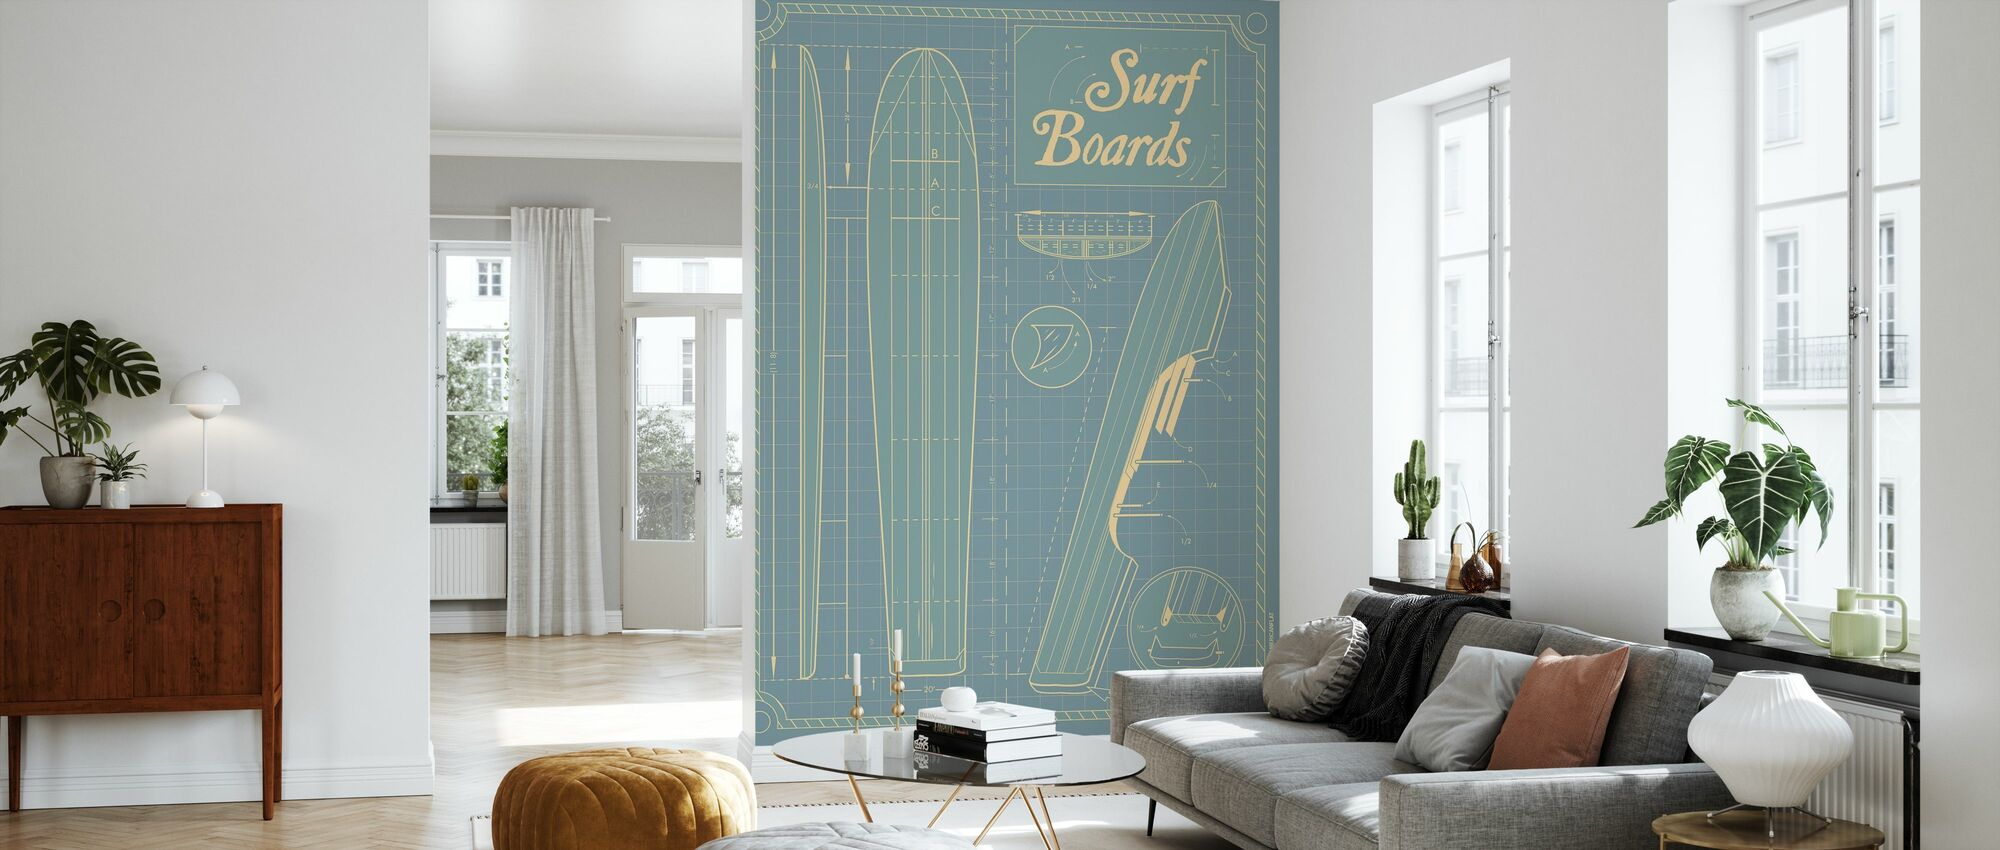 Surffilaudat - Tapetti - Olohuone